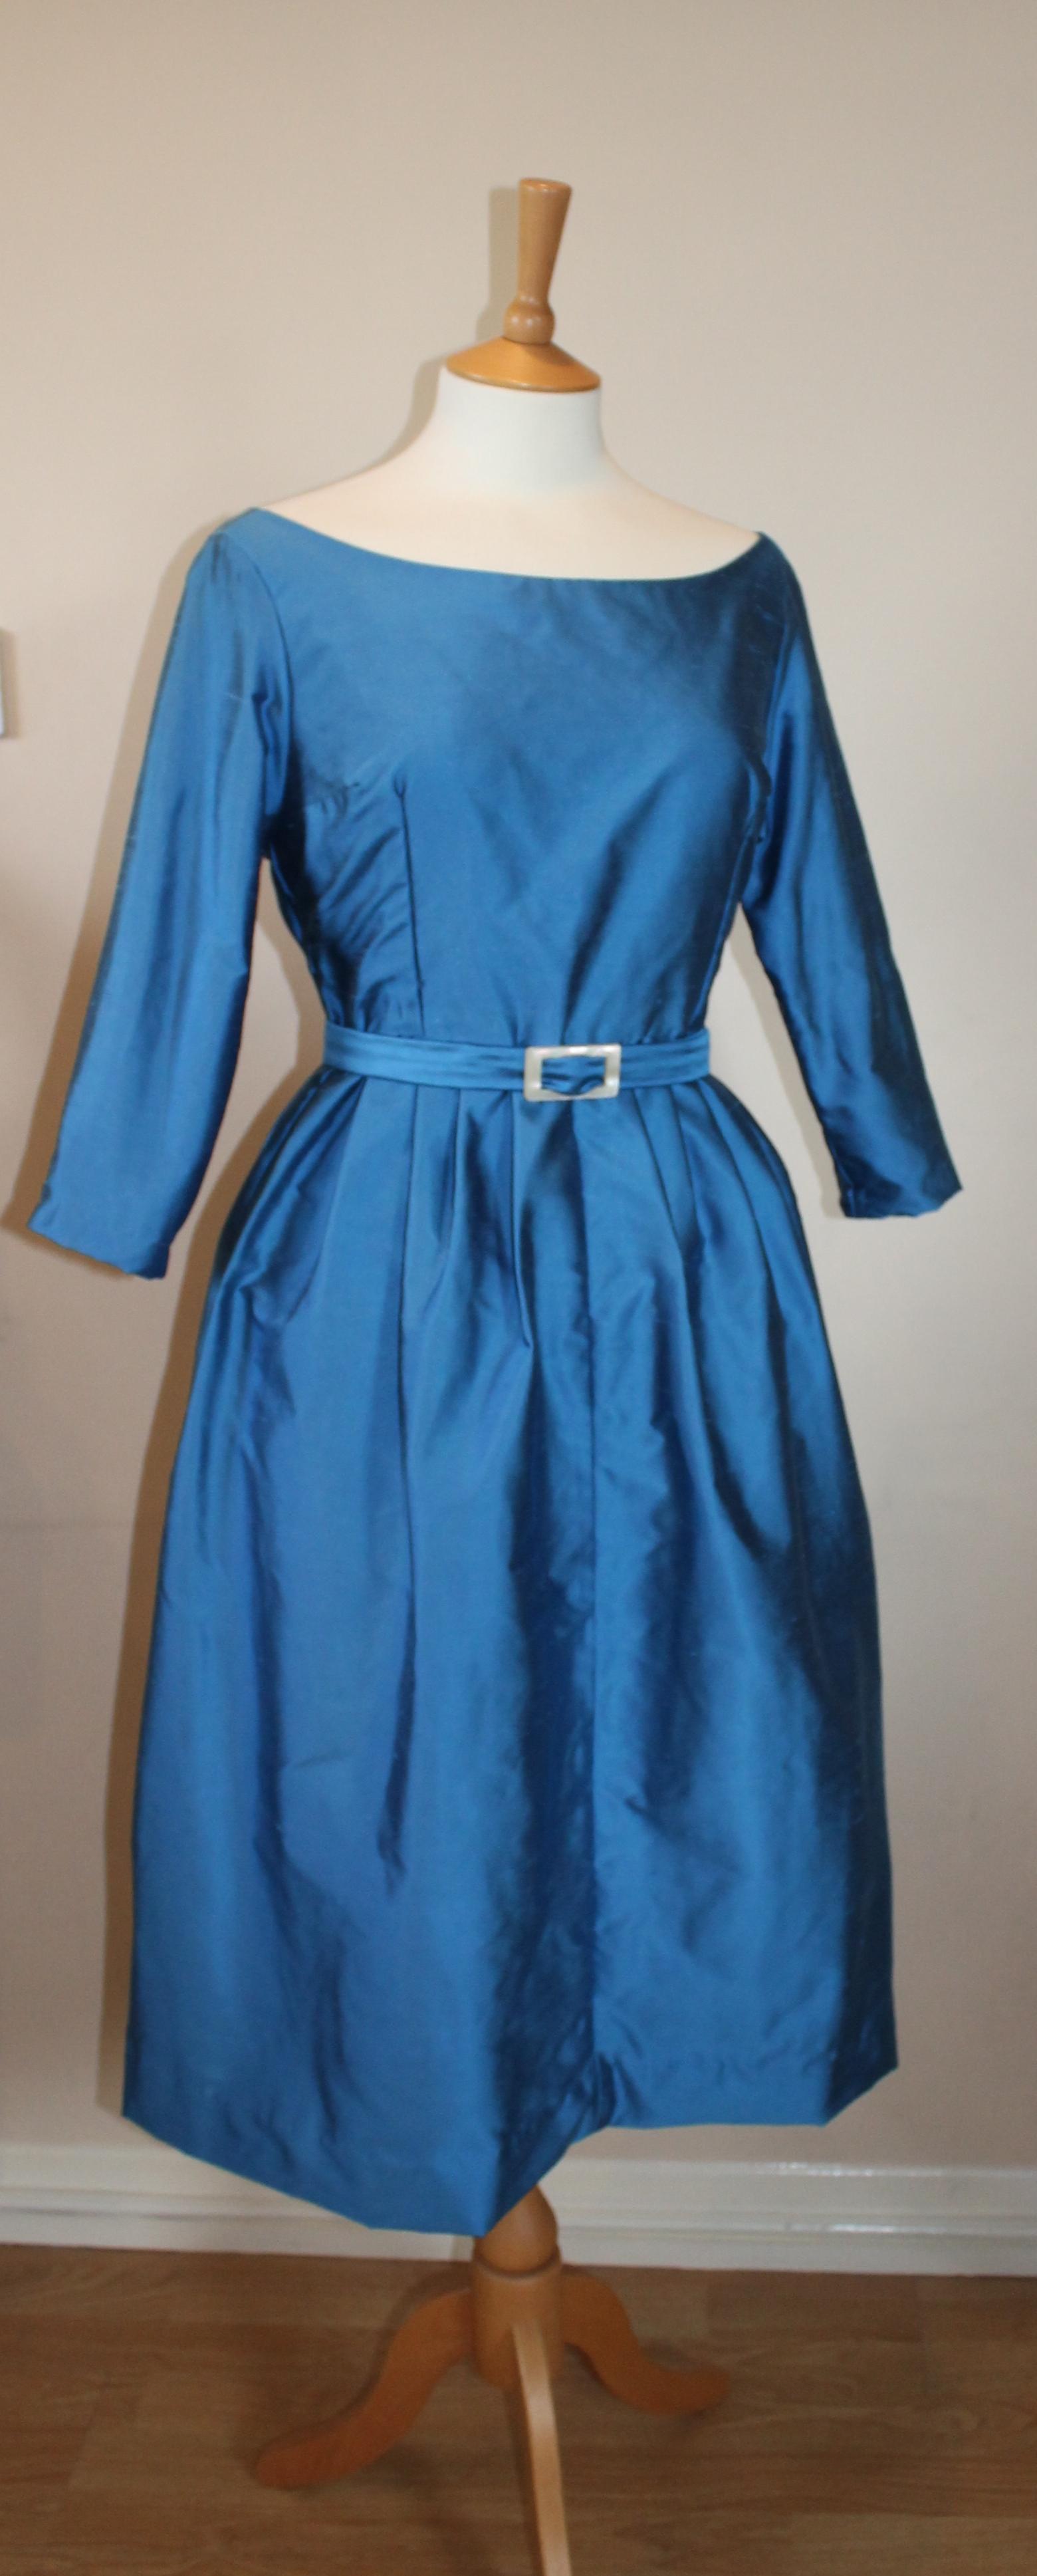 early 60s style kingfisher blue taffeta cocktail dress